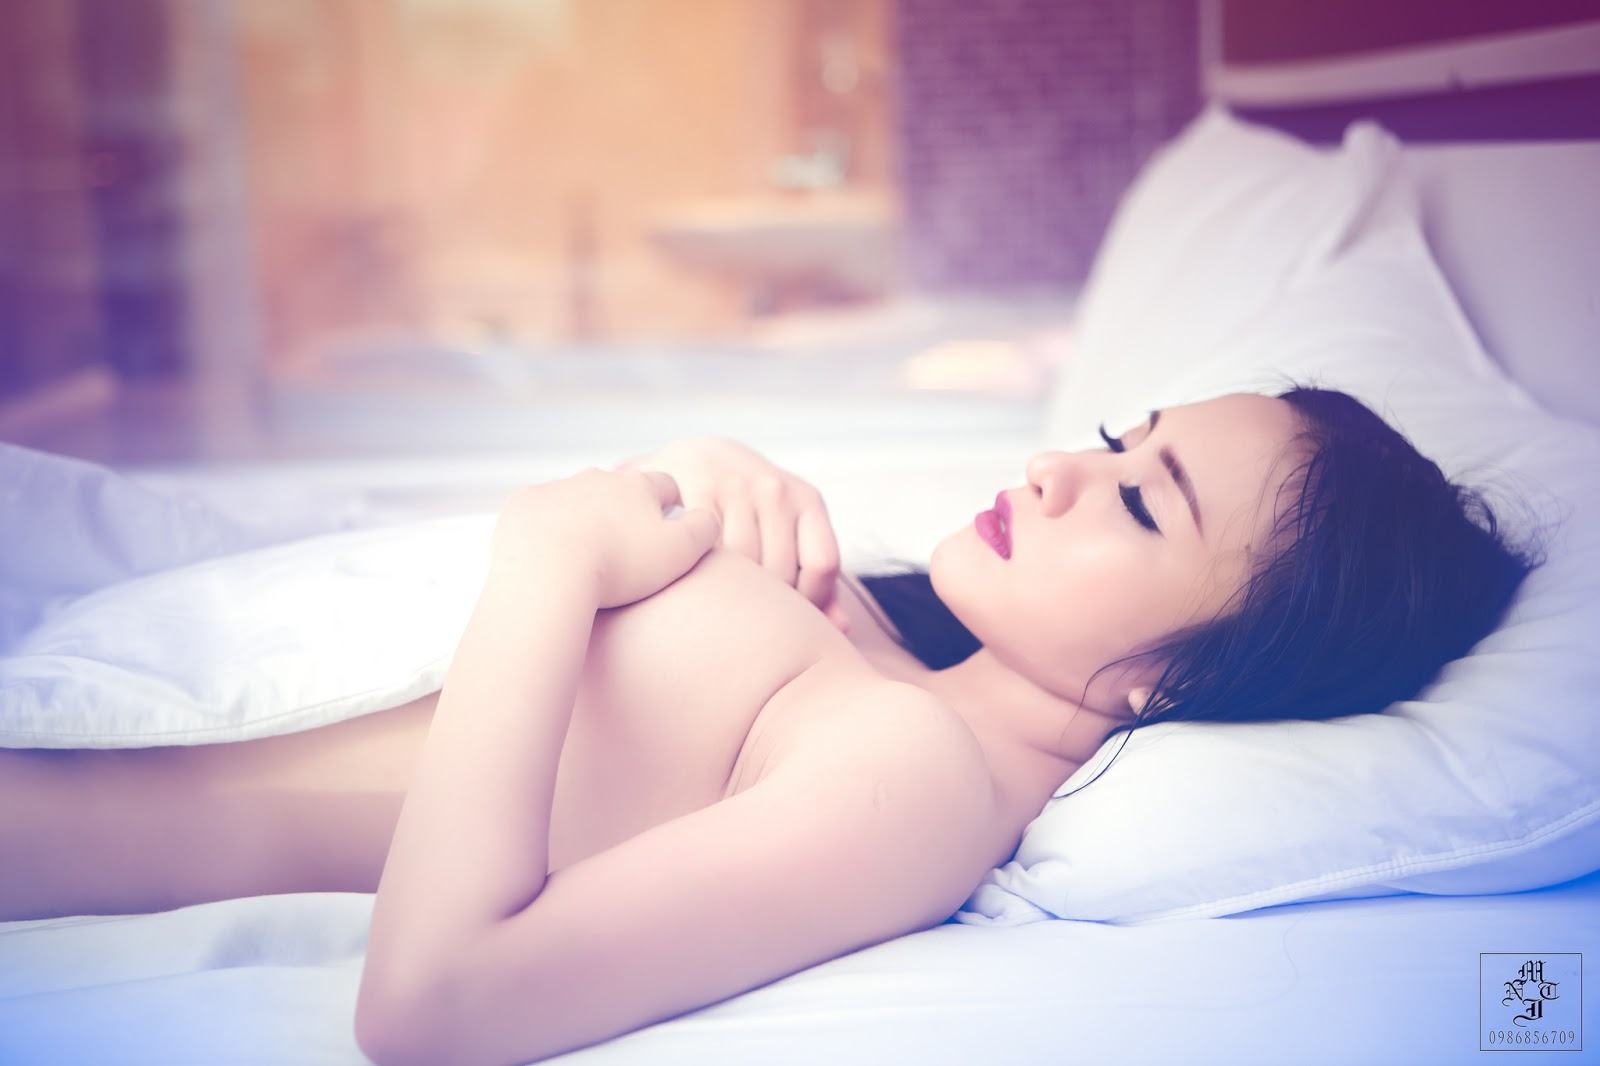 anh-nude-hot-girl-06.jpg